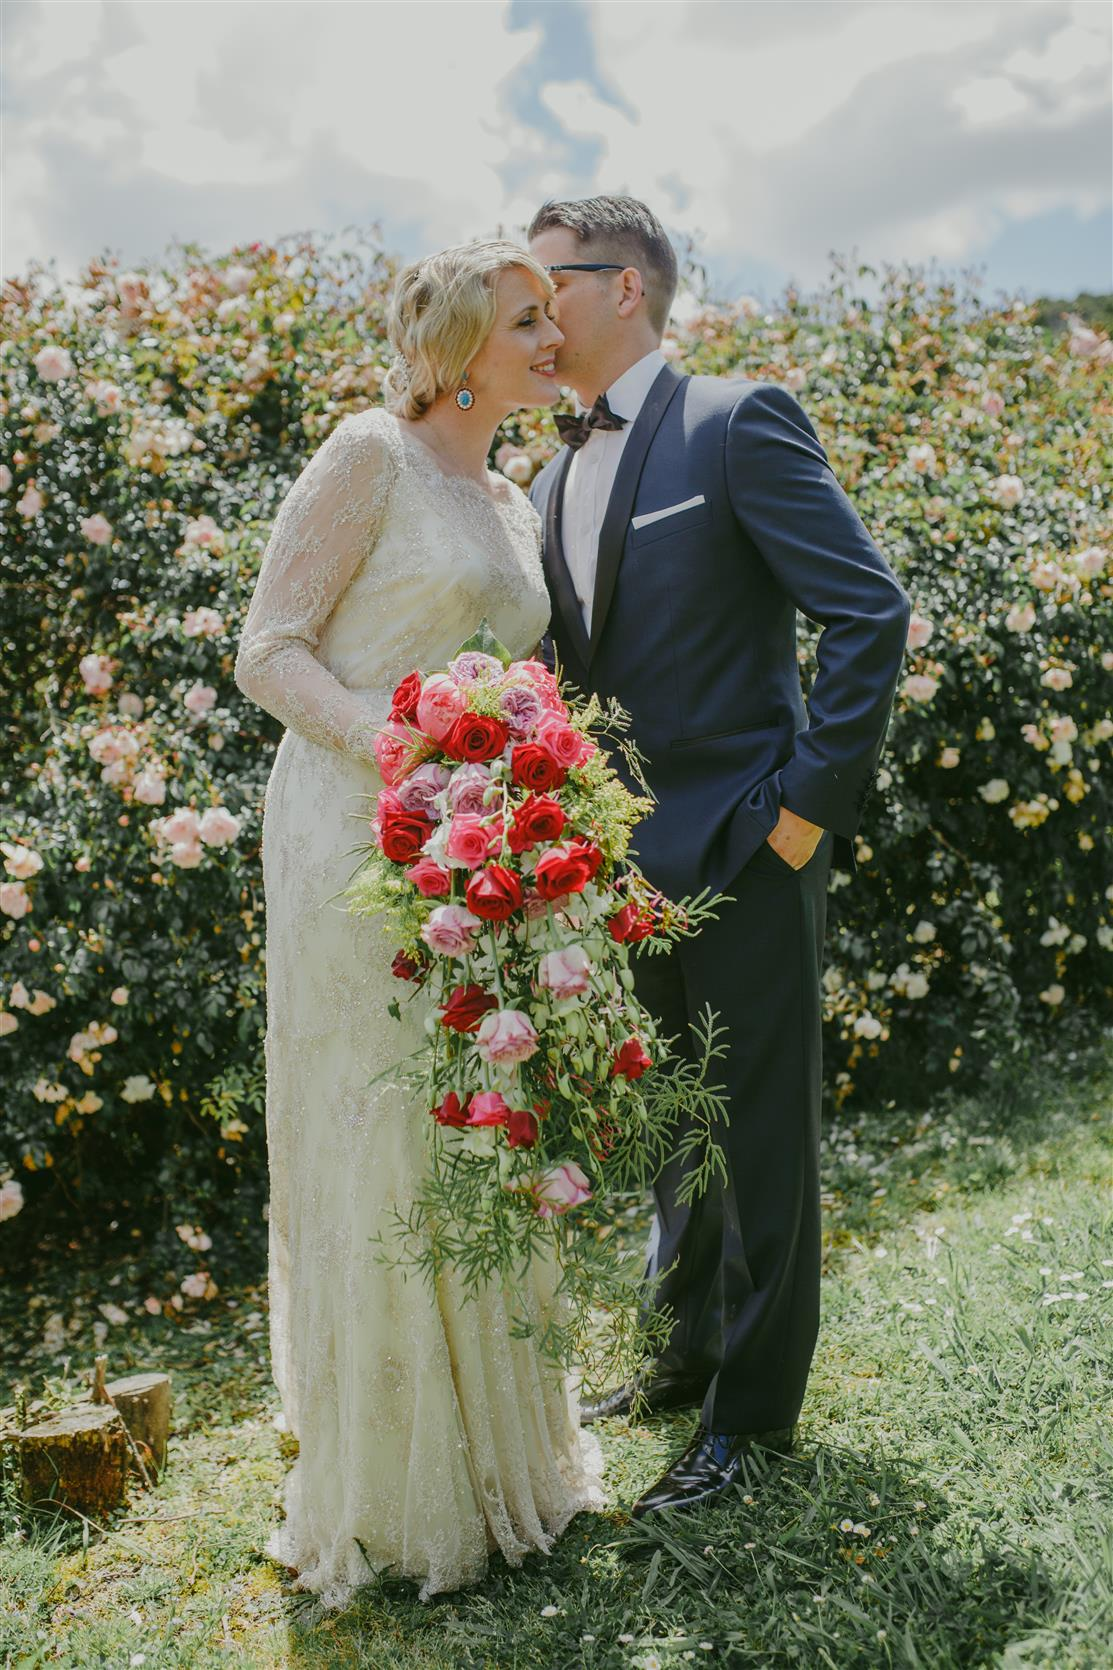 An Elegant Modern Vintage Spring Wedding